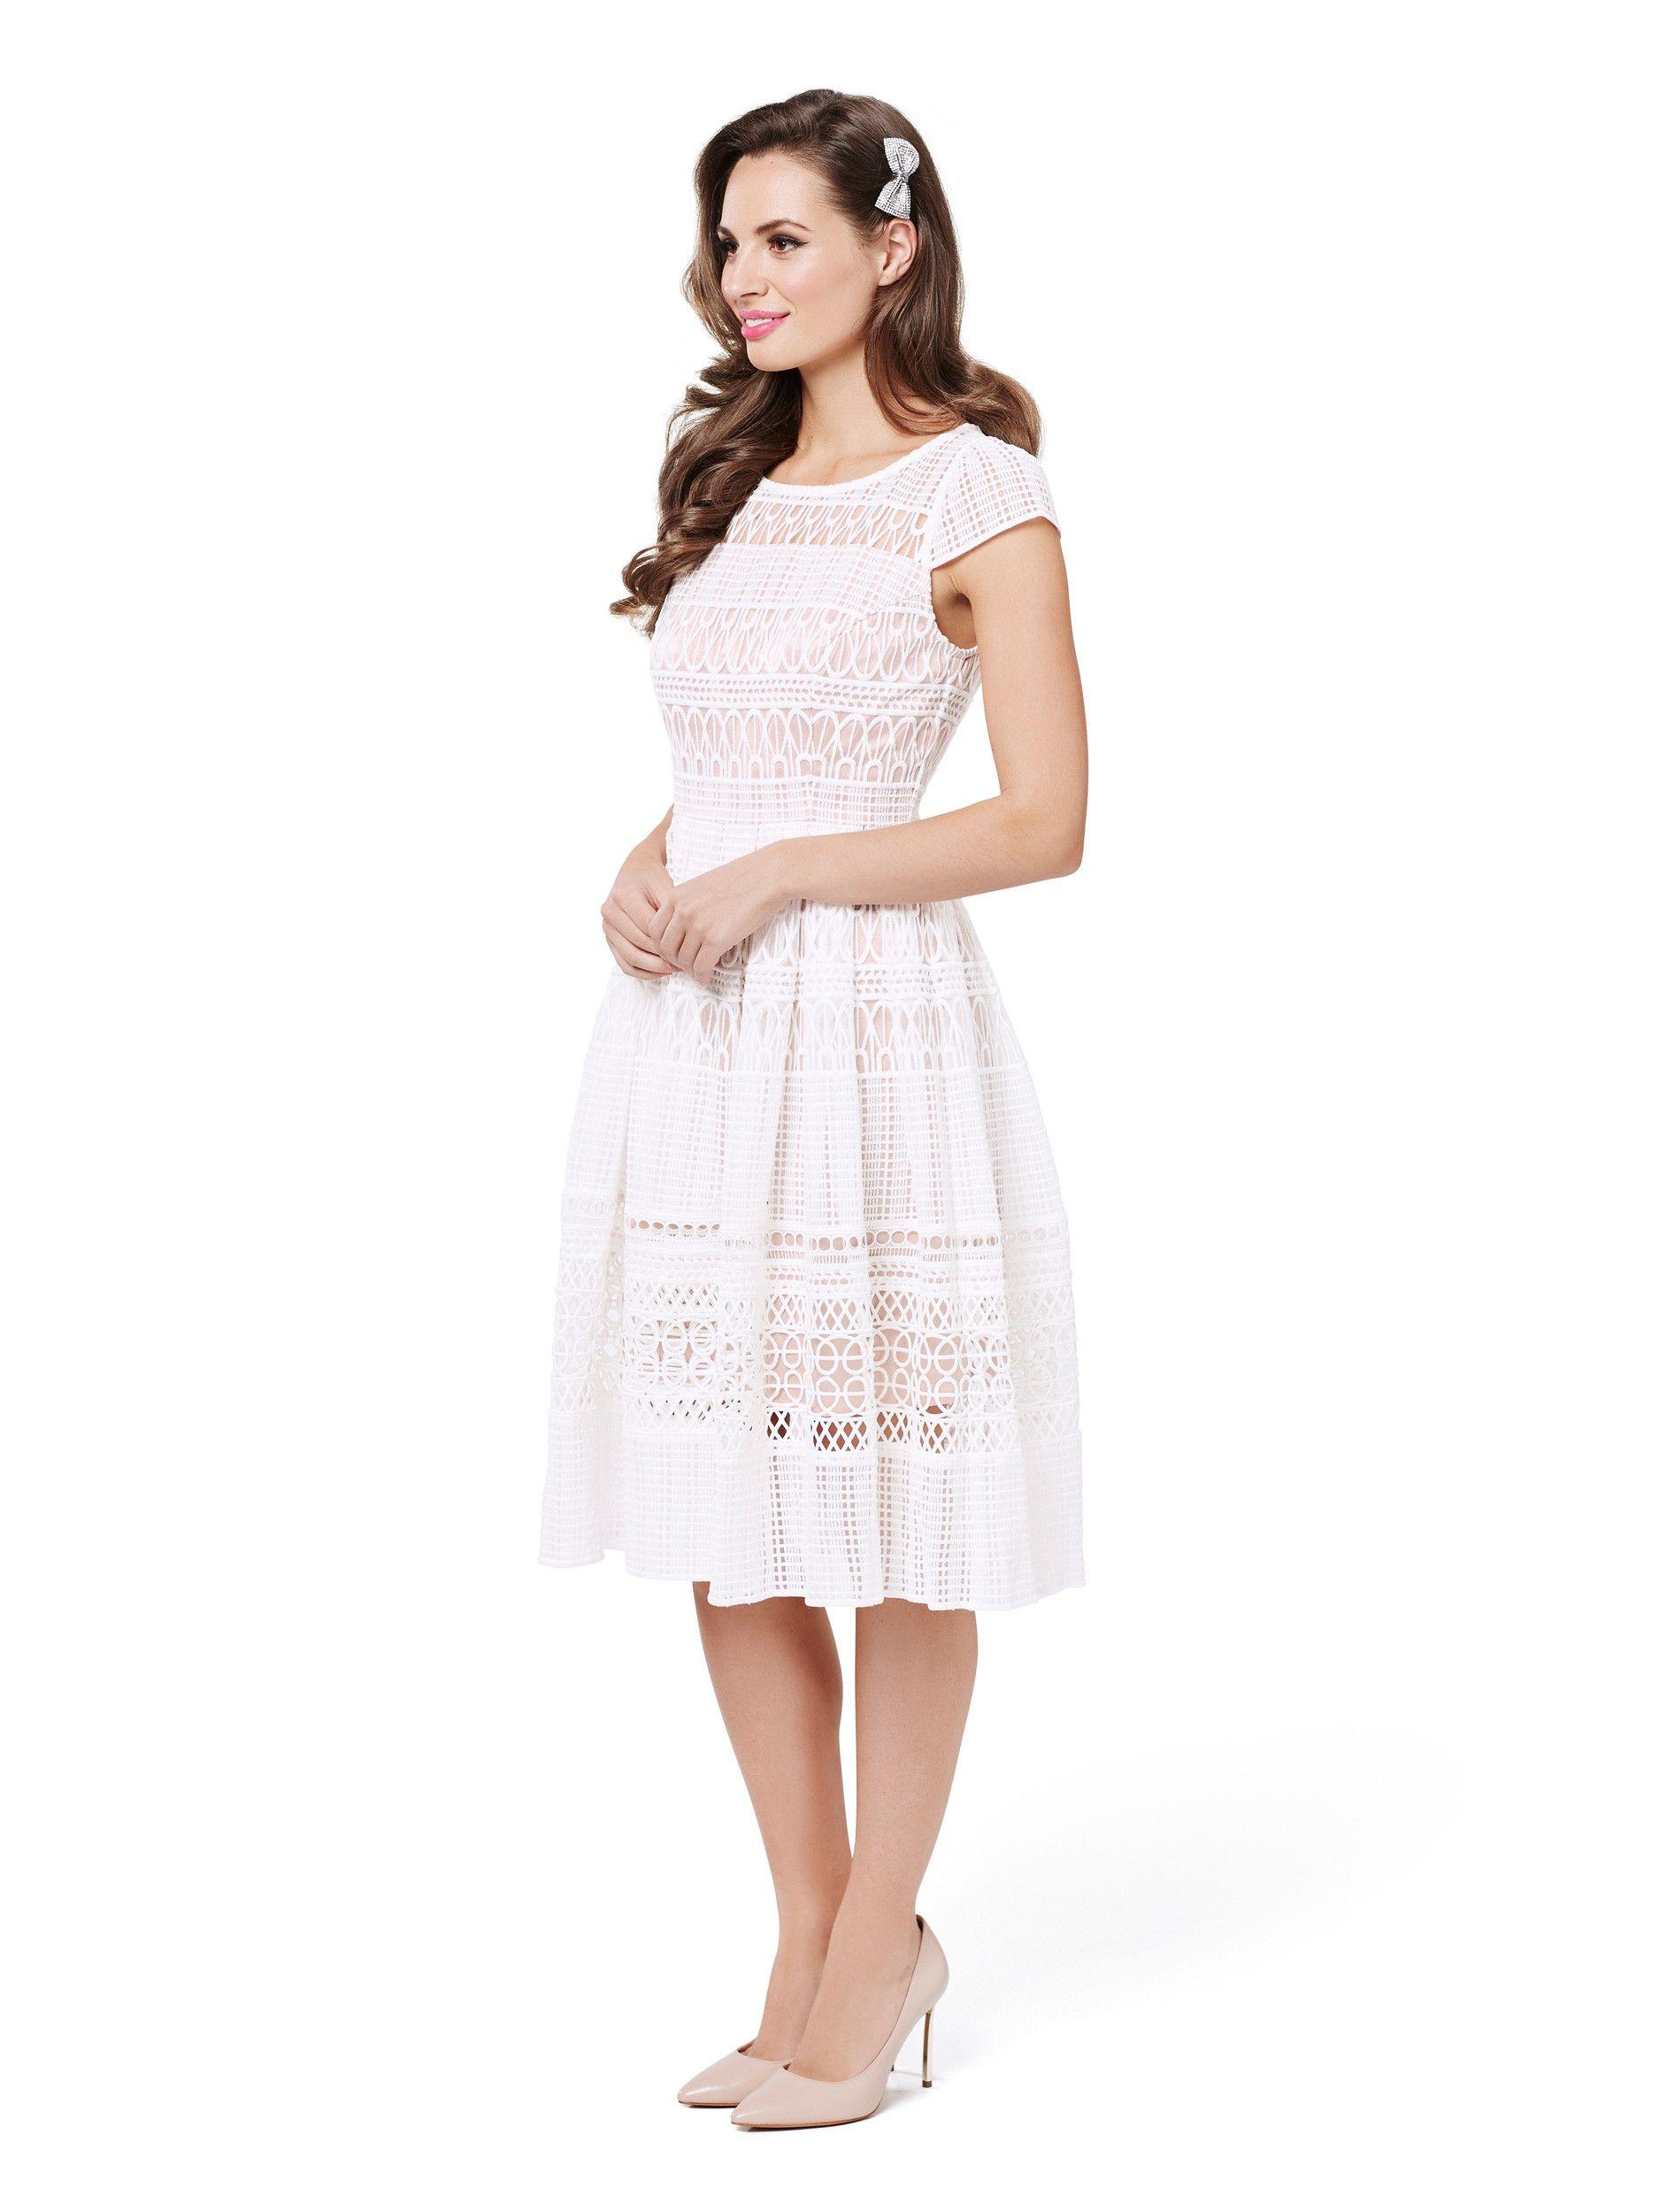 Casual wedding dresses for fuller figures  Saint Petersburg Dress  Wish List  Pinterest  Saints Dress